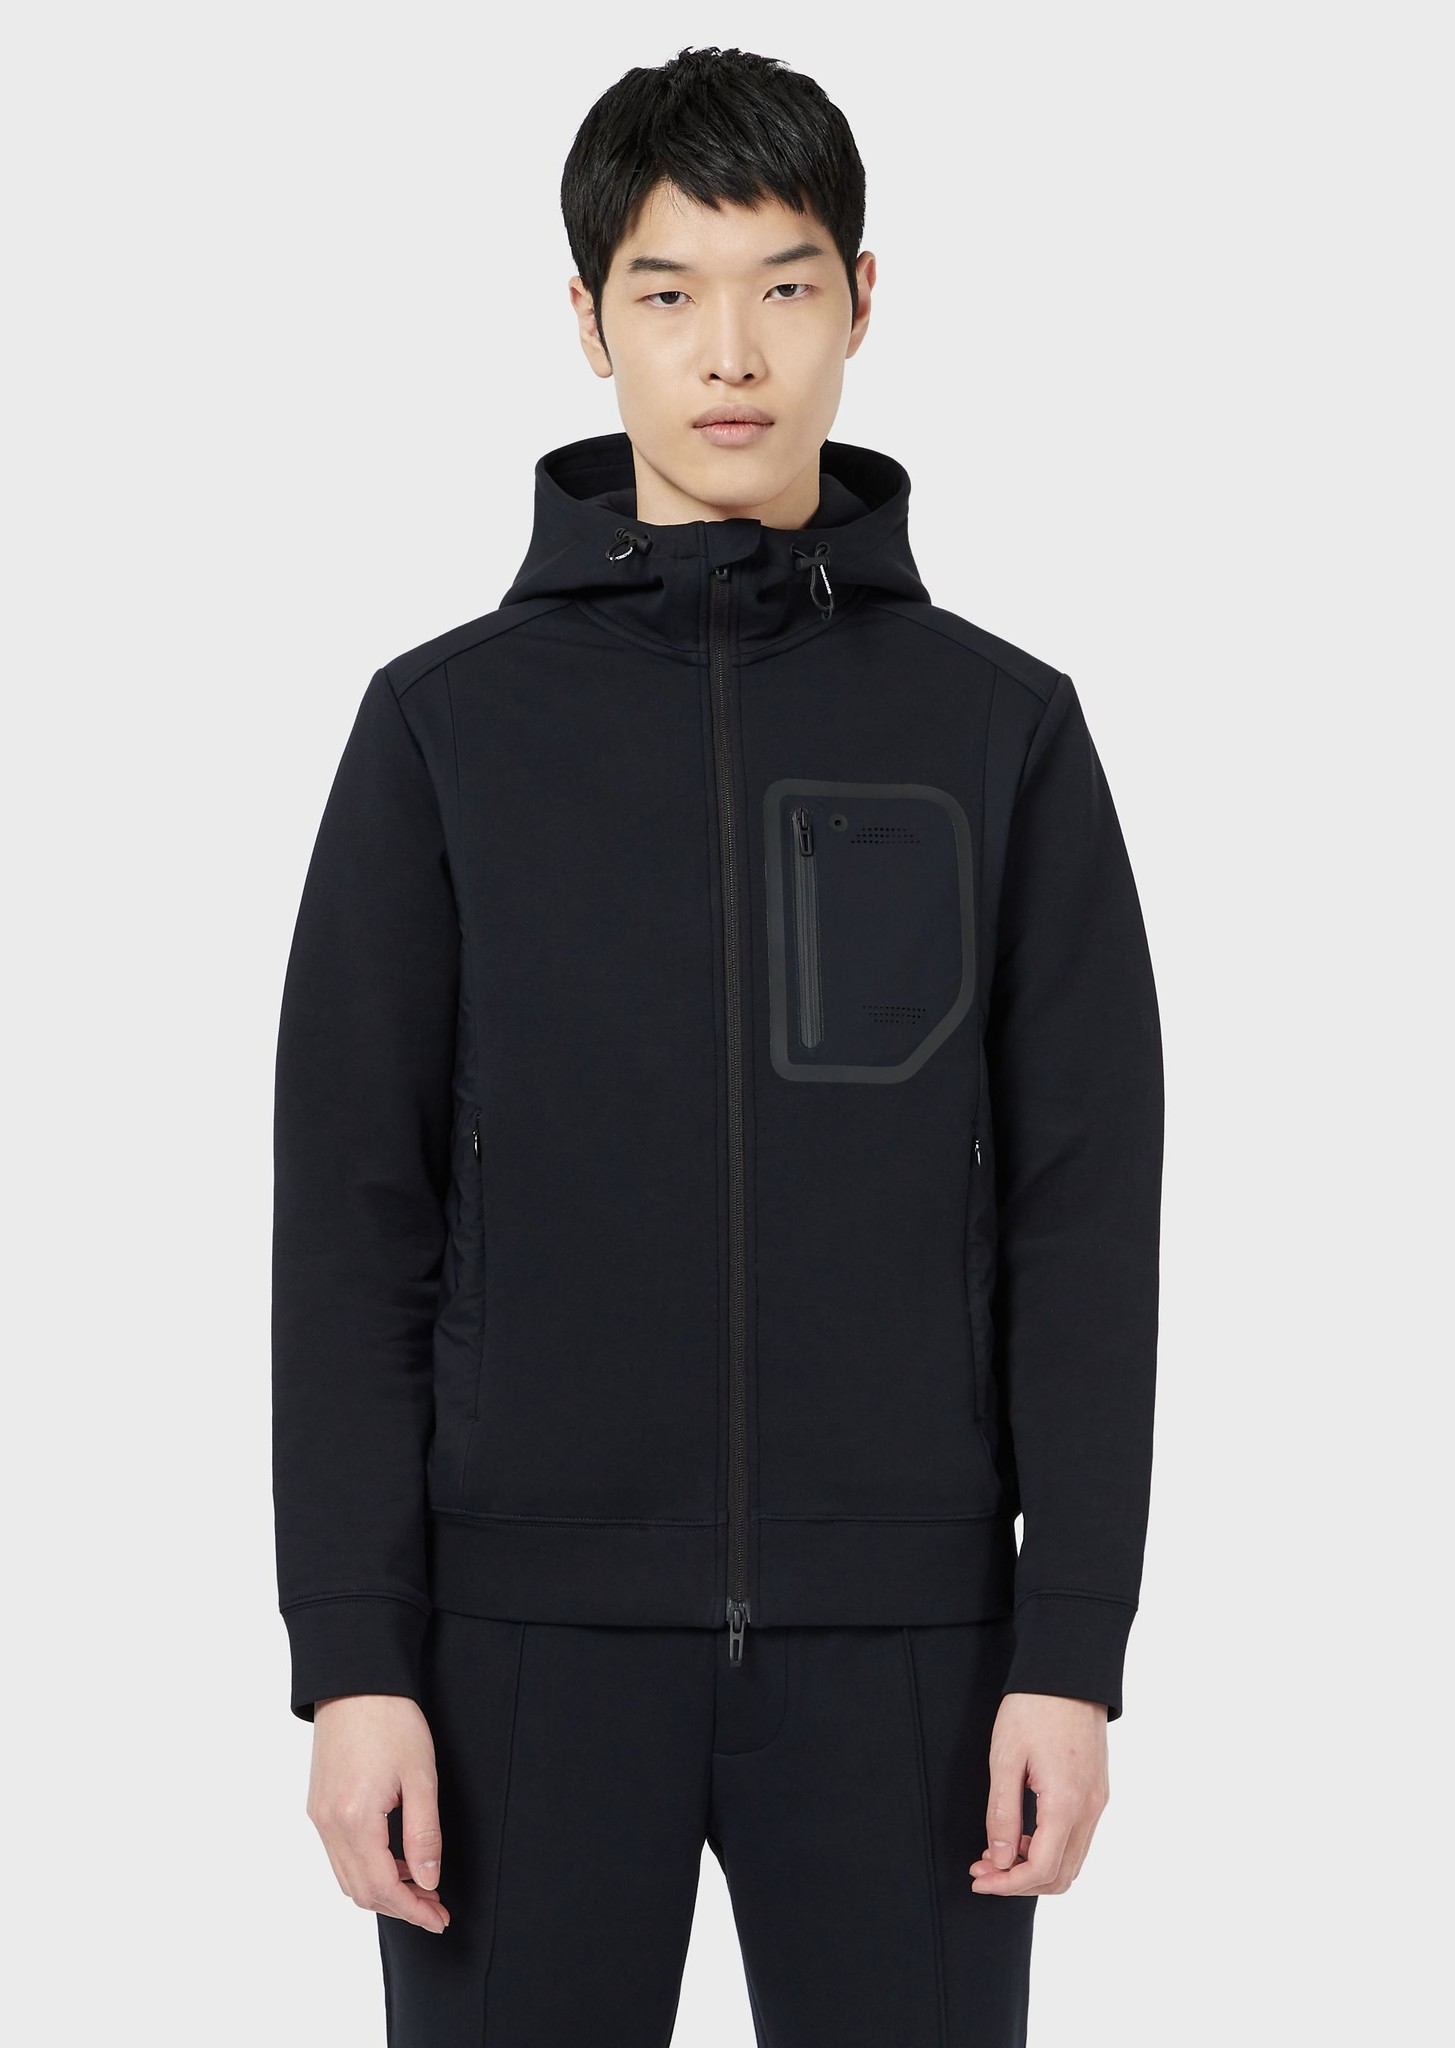 Travel Essentials Hooded Sweatshirt-2